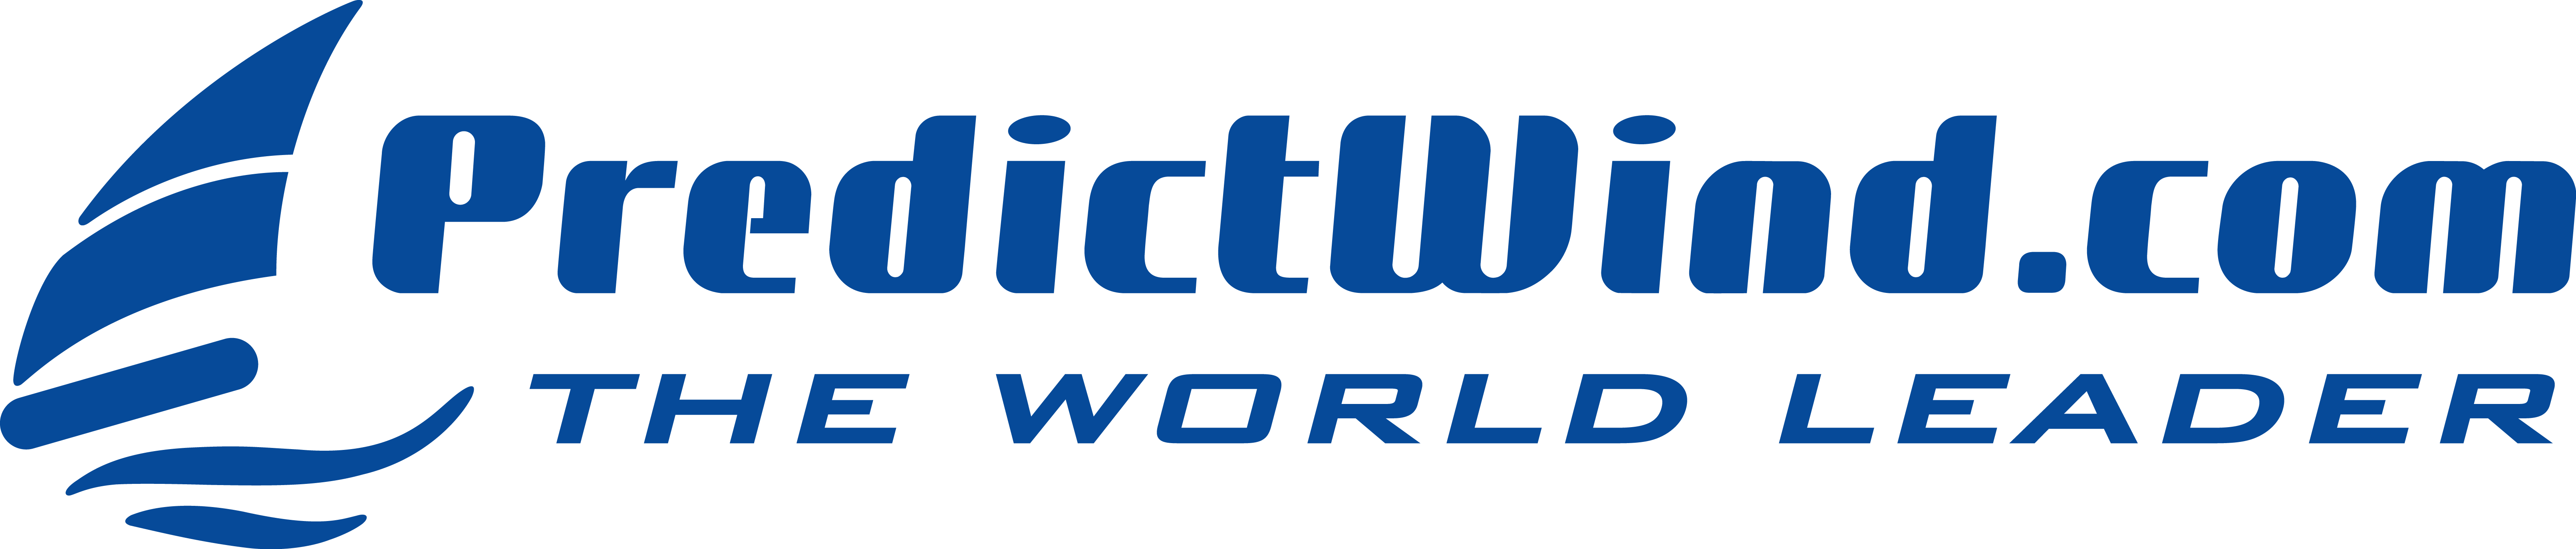 predictwind-logo